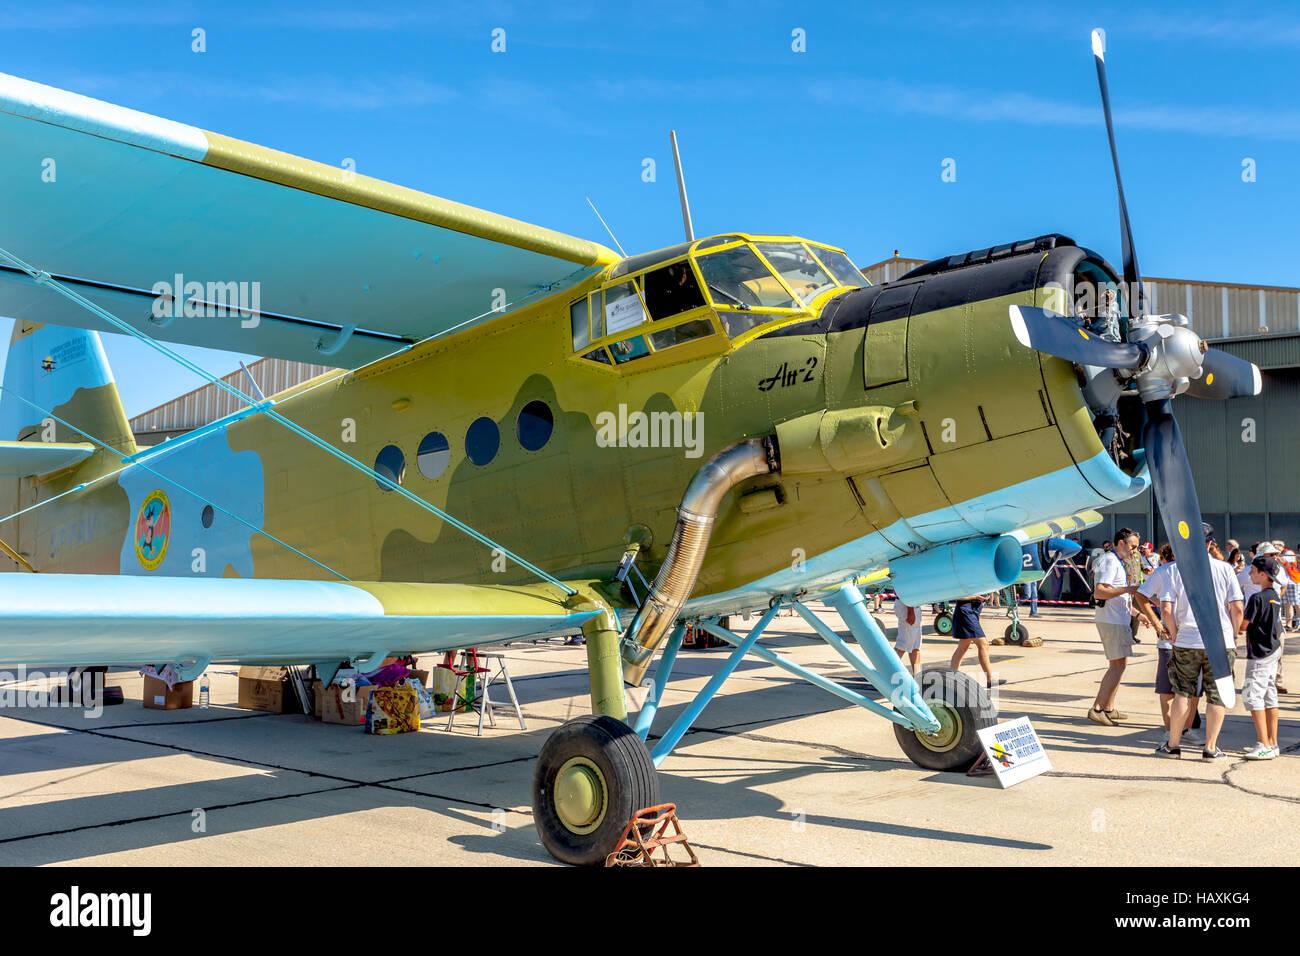 Aircraft Antonov An-2 - Stock Image